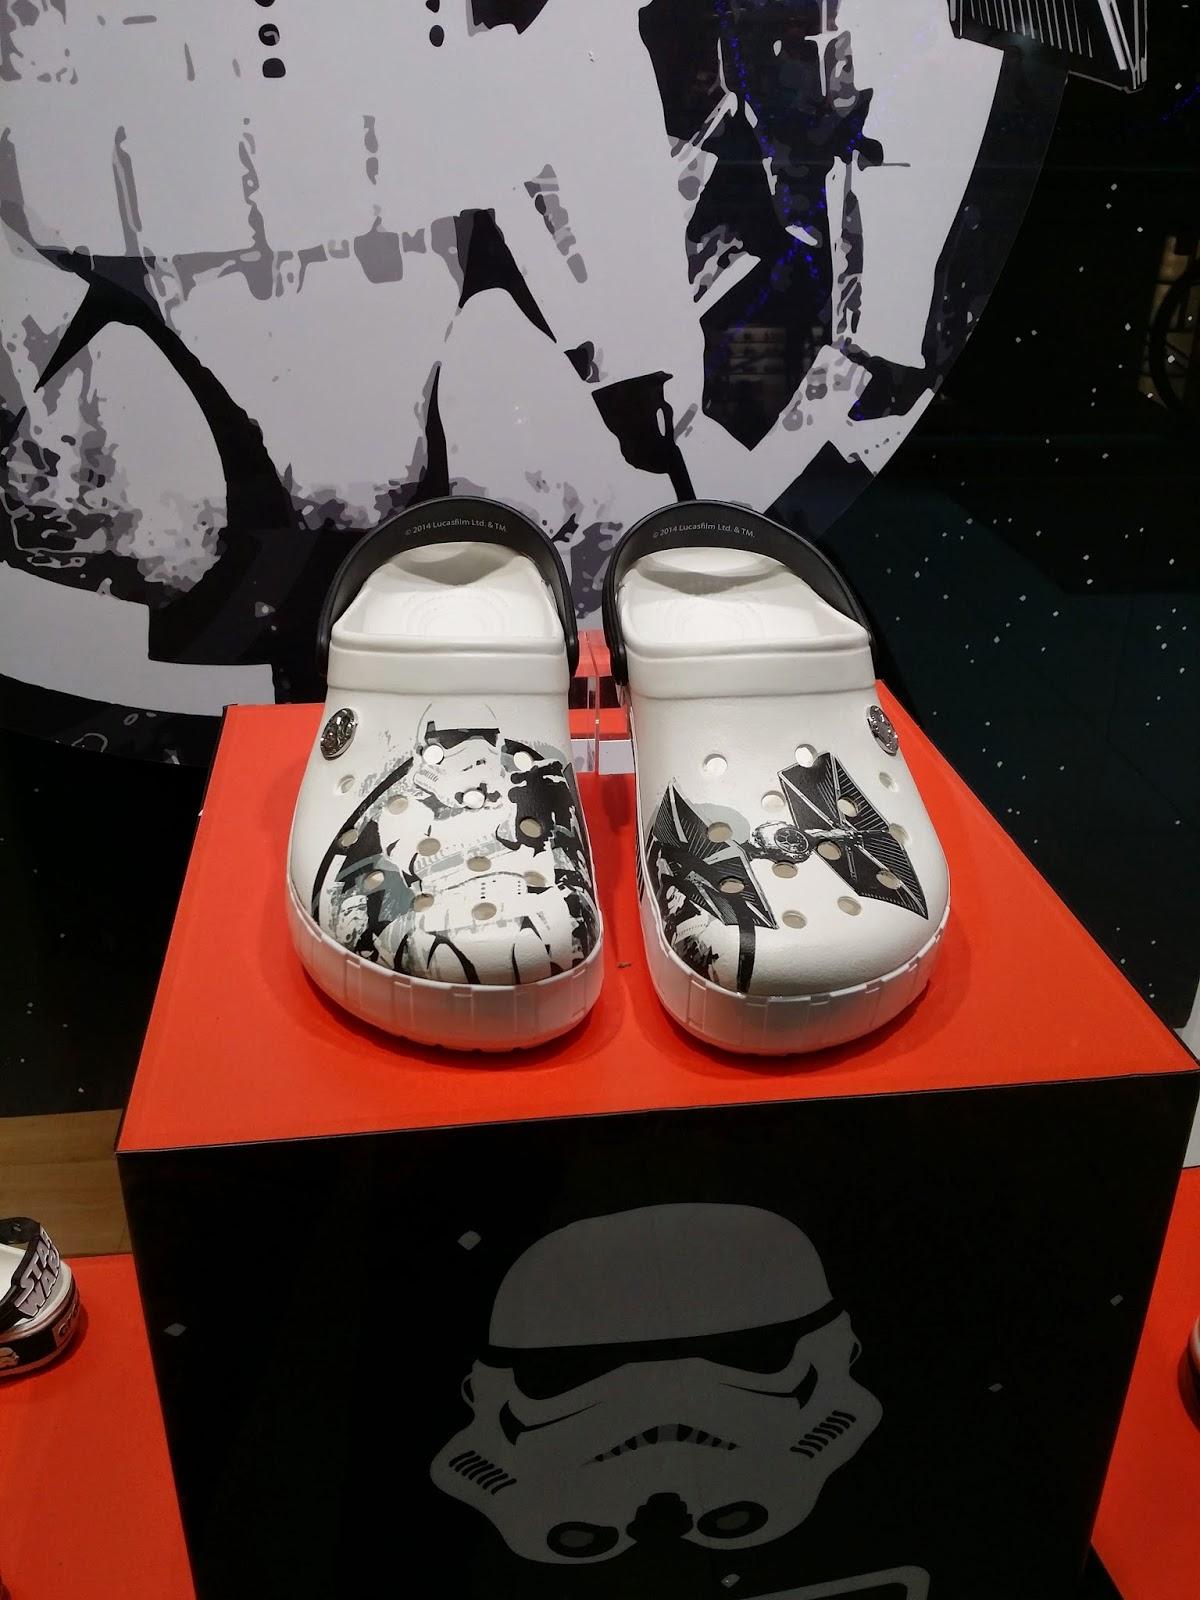 Xing fu star wars merchandise for Merchandising star wars